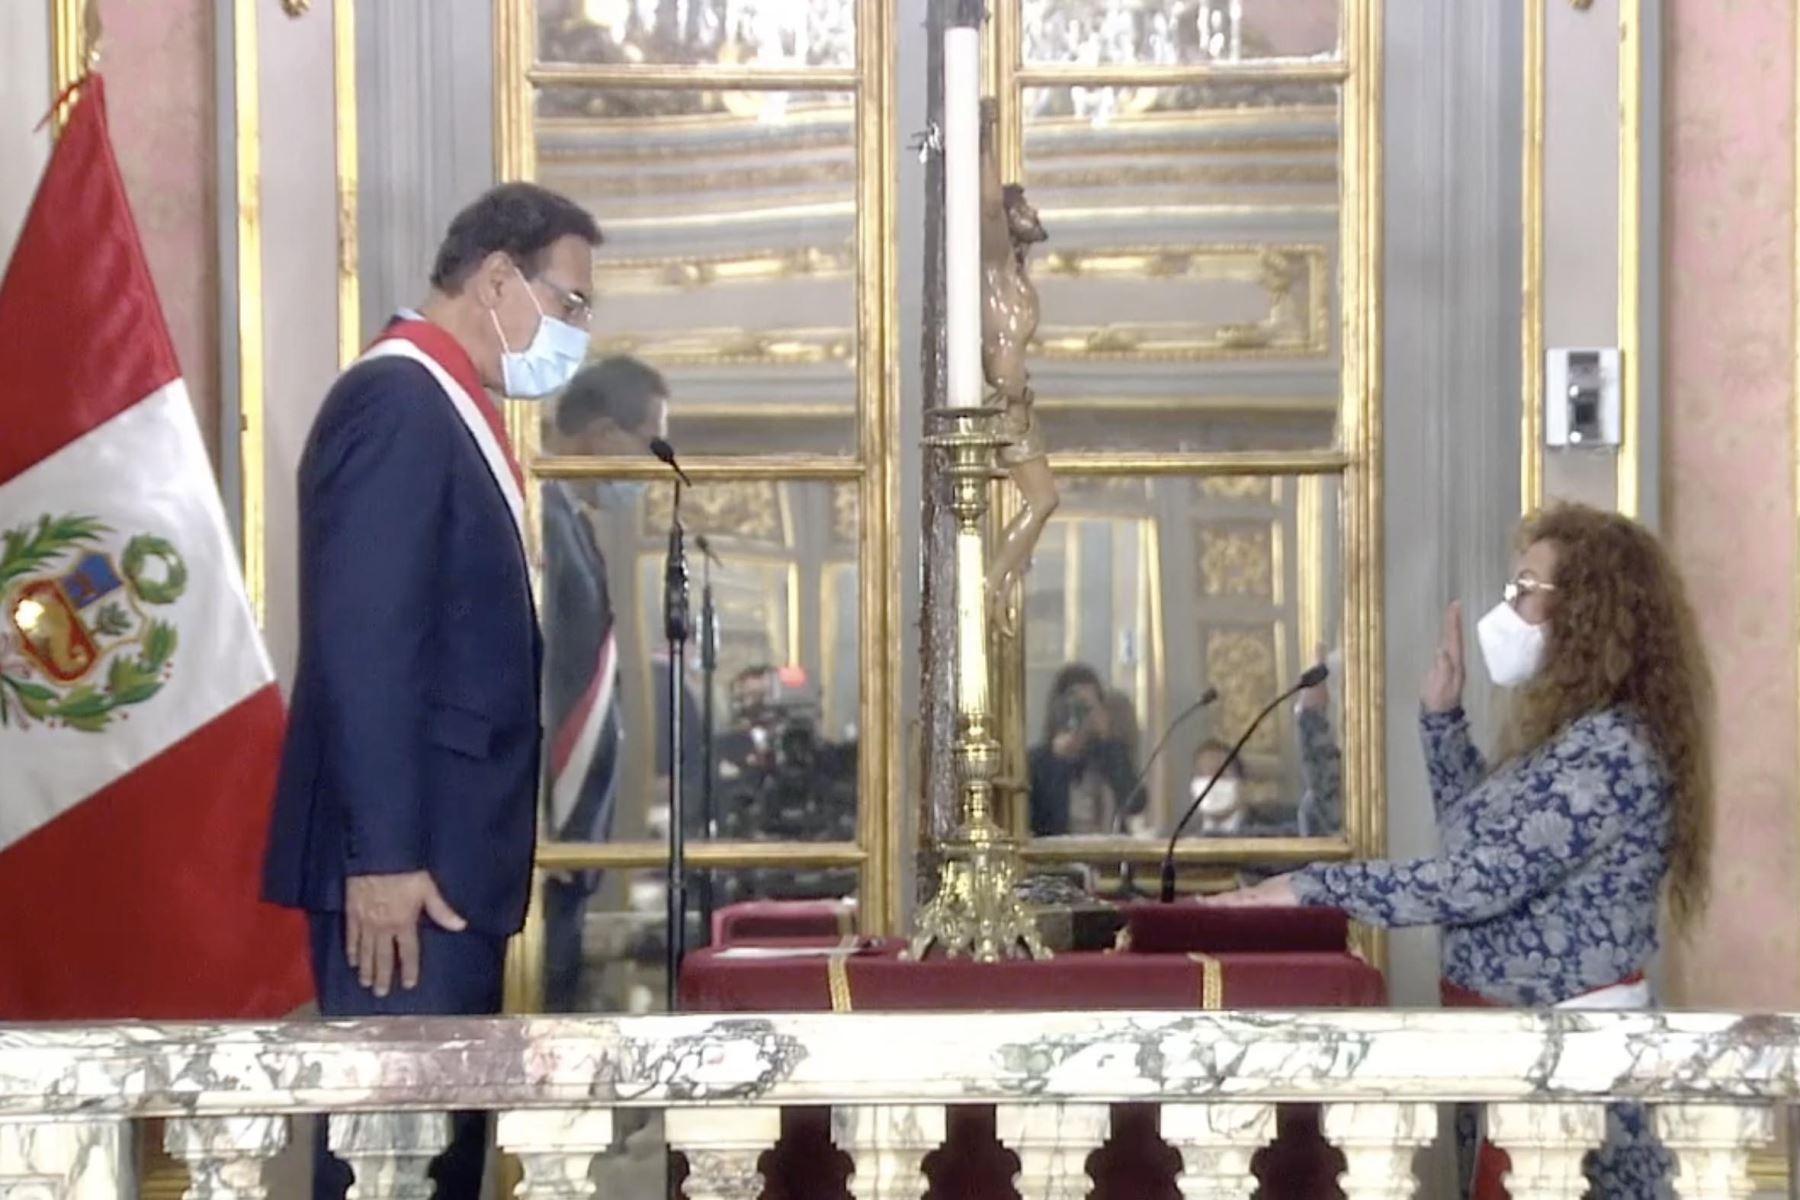 Presidente Martín Vizcarra toma juramento de Kirla Echegaray como ministra del Ambiente. Foto: ANDINA/Prensa Presidencia